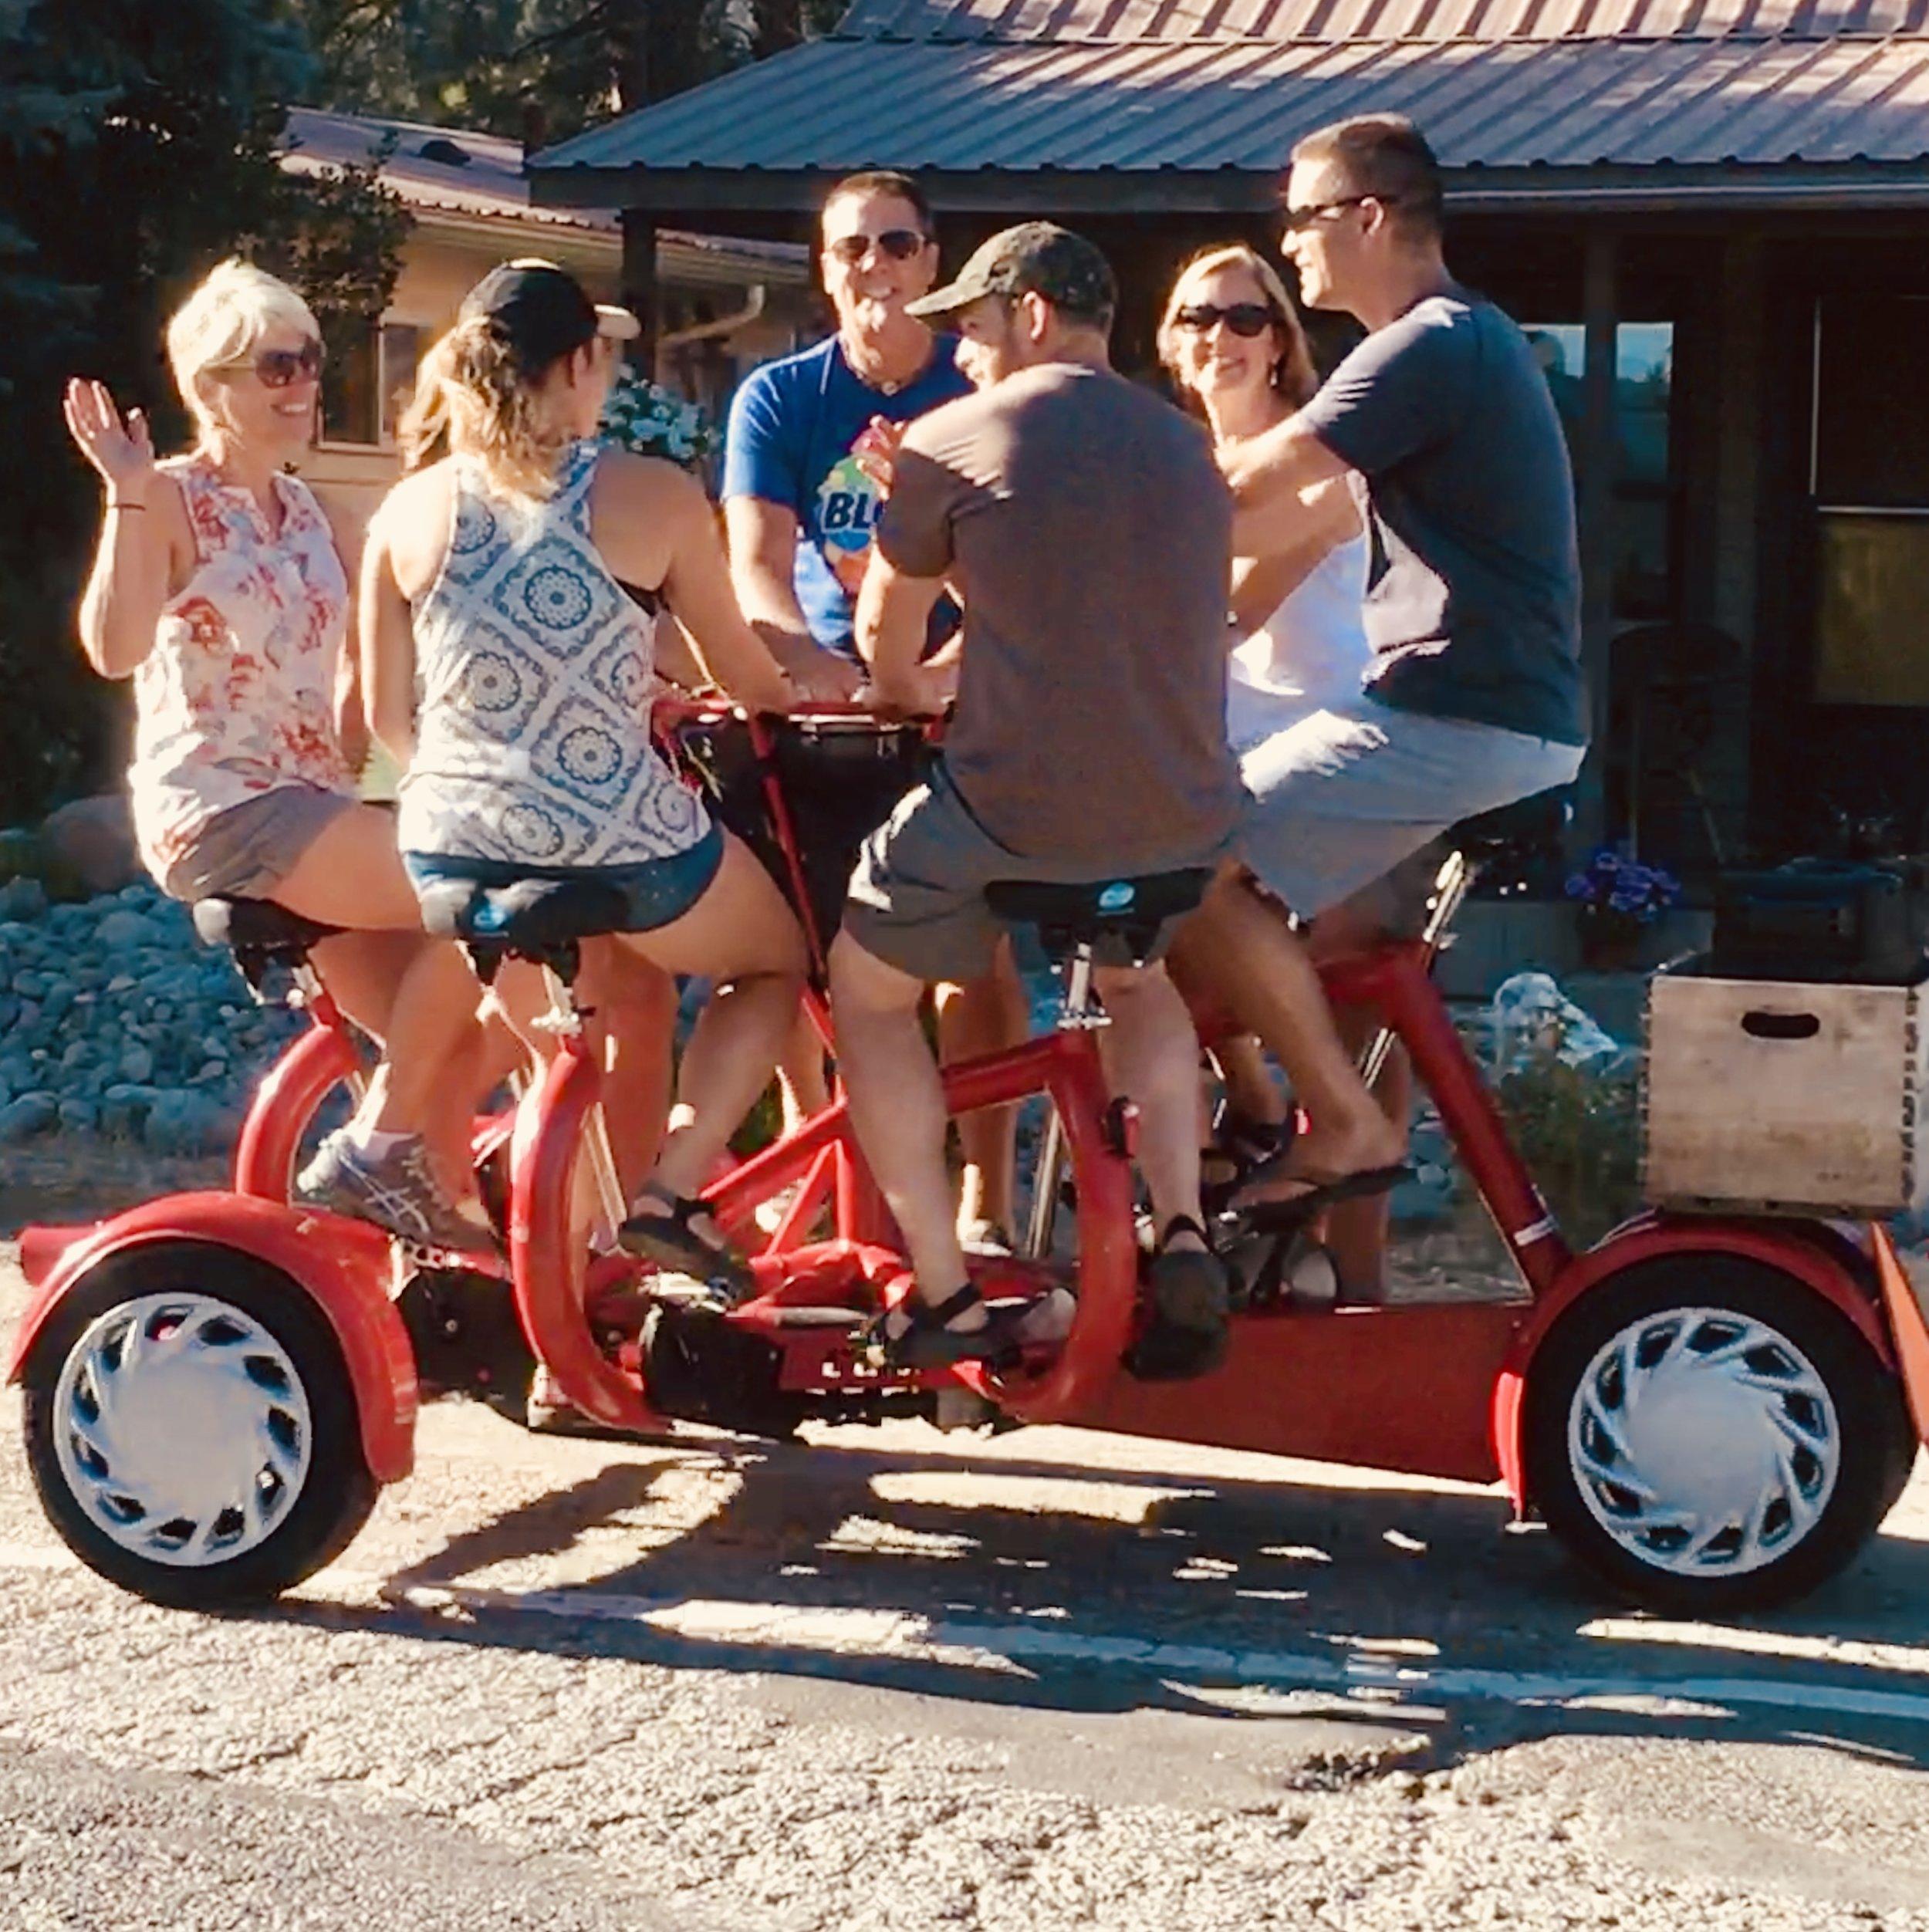 Leavenworth Radtour Group